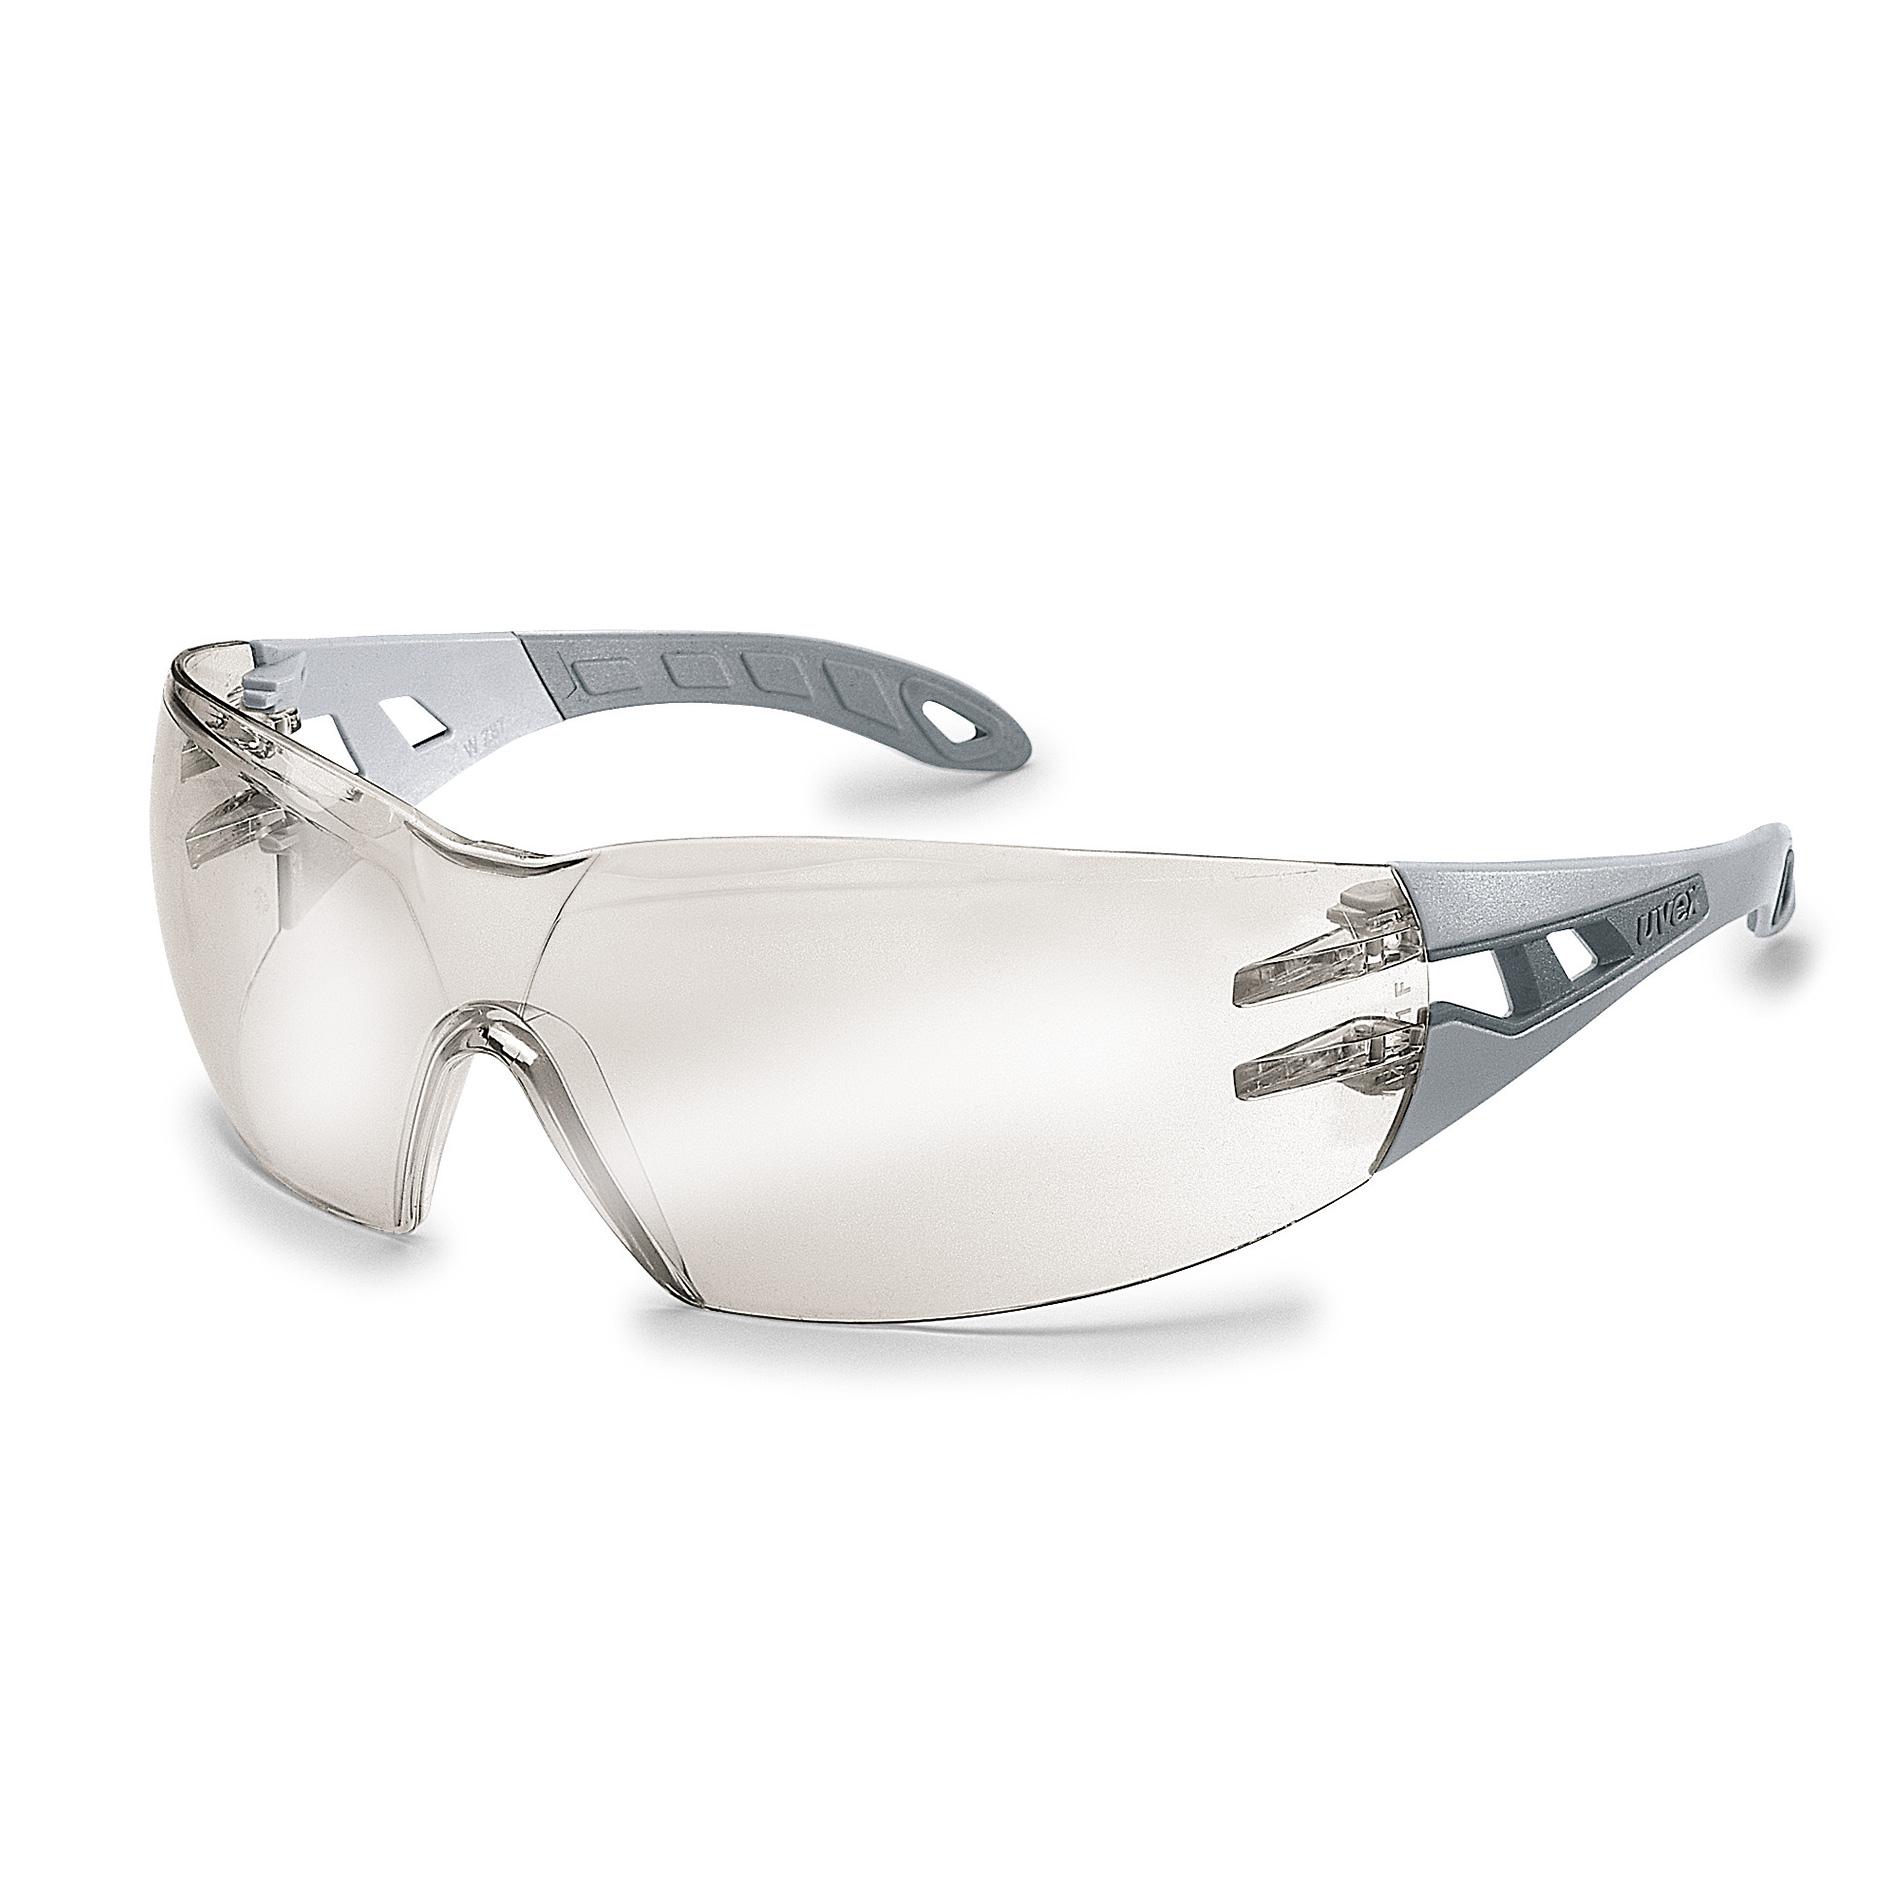 2d4006150eb uvex pheos s spectacles